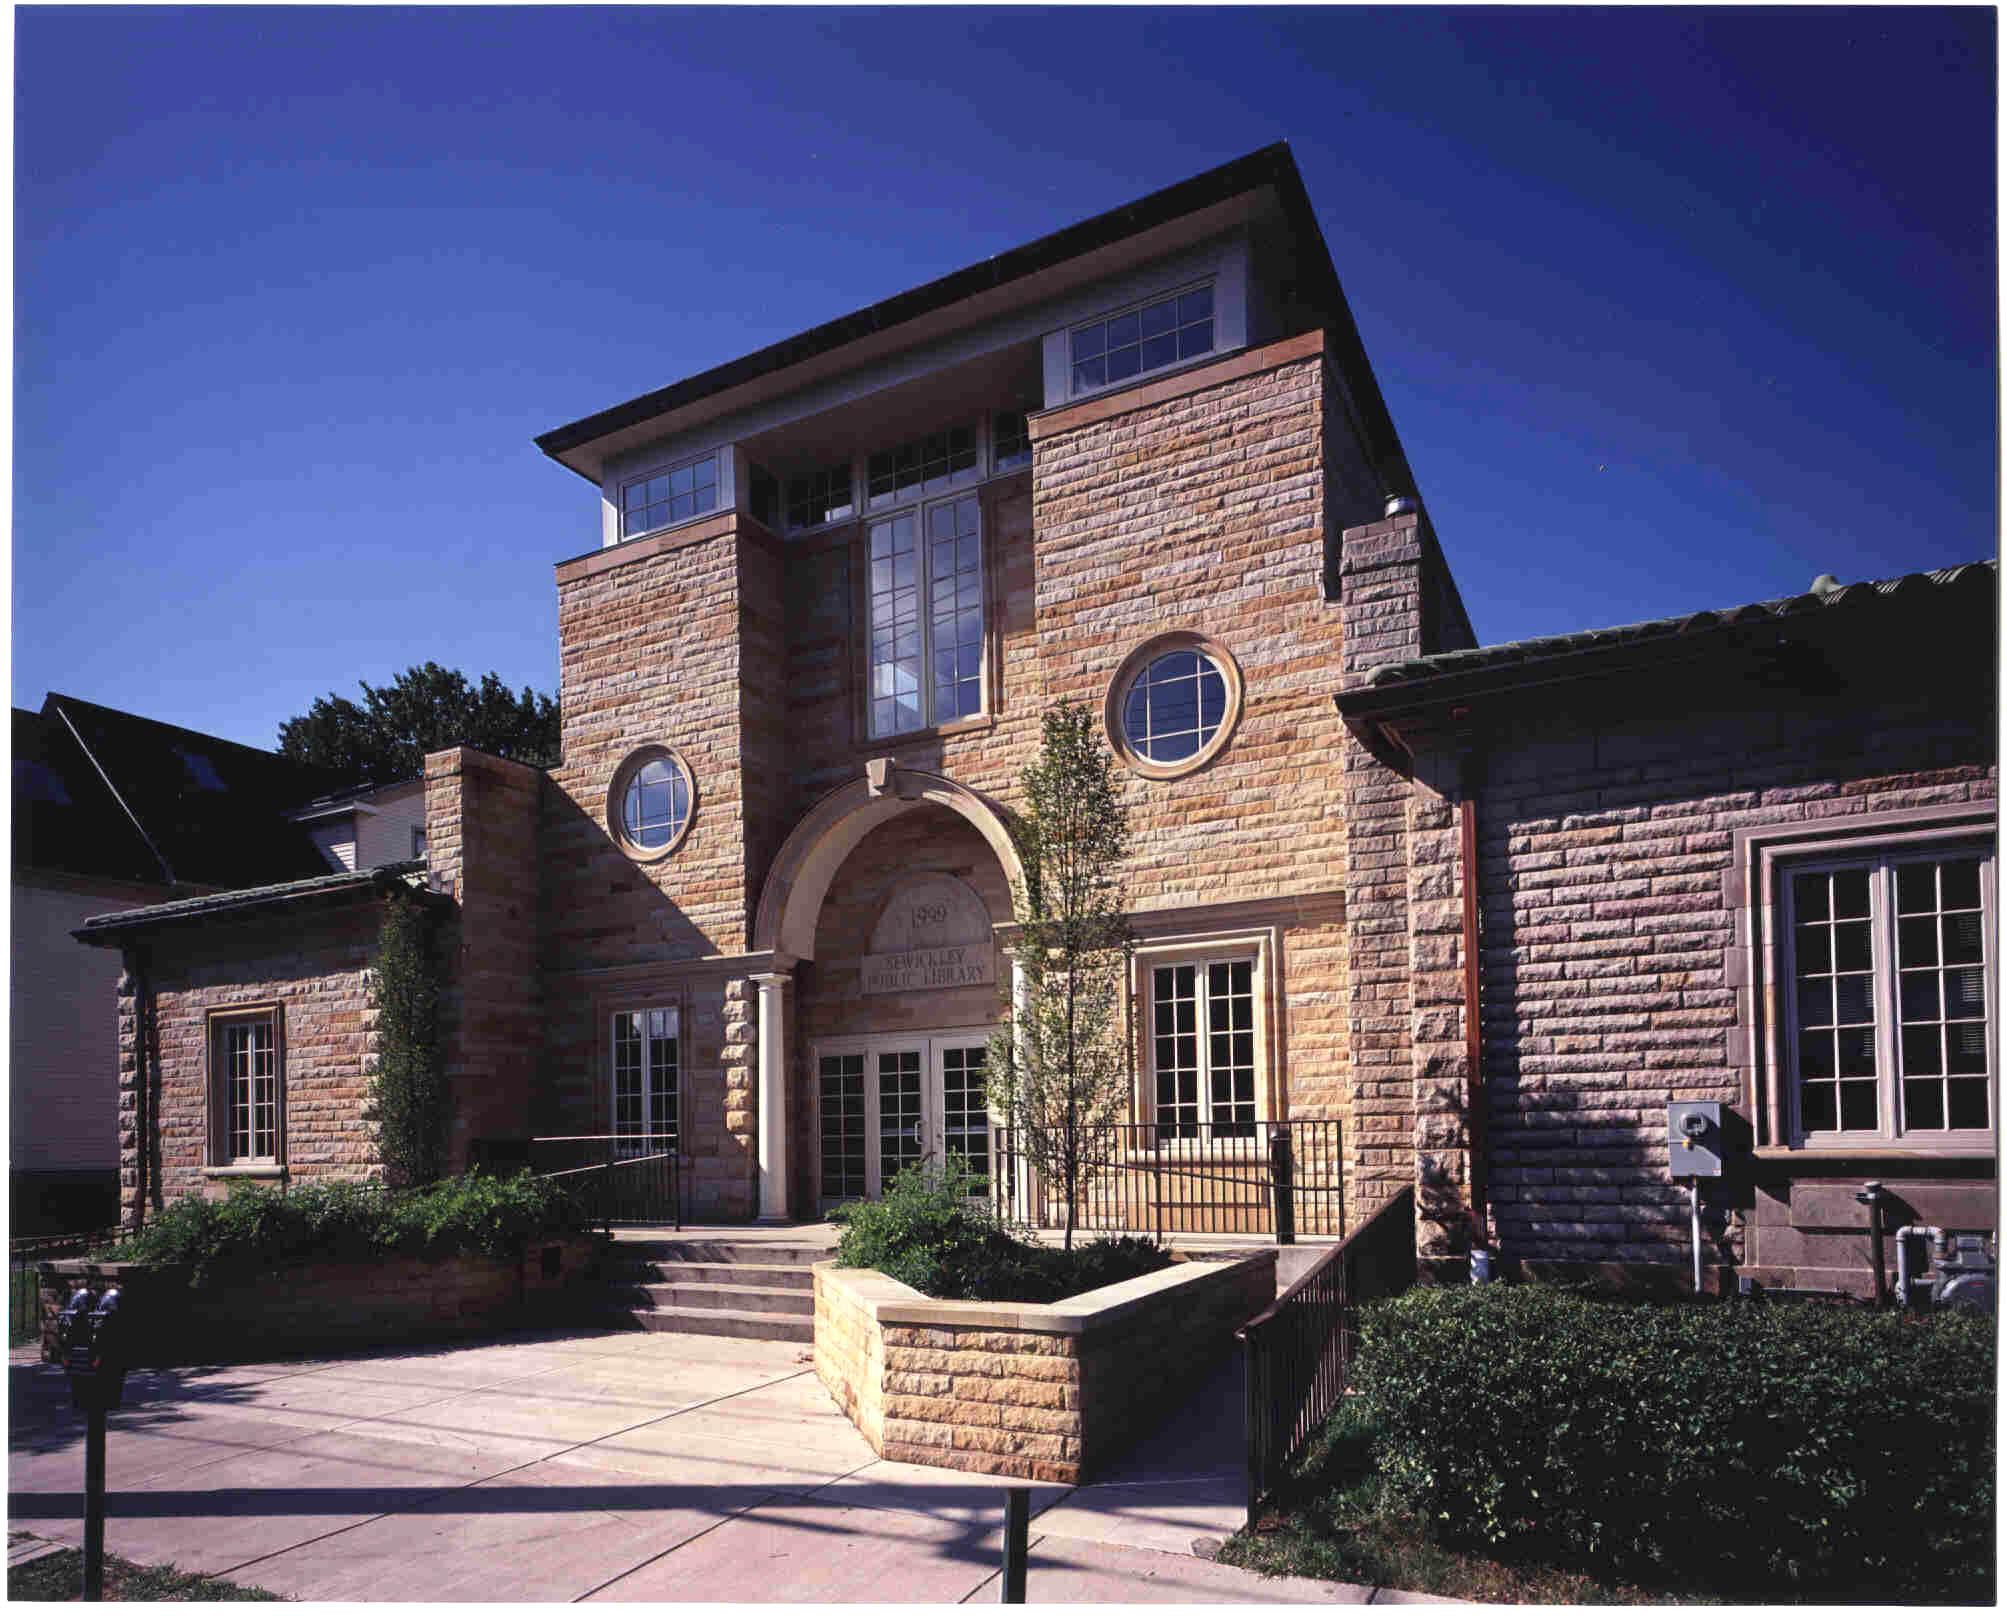 Sewickley Public Library